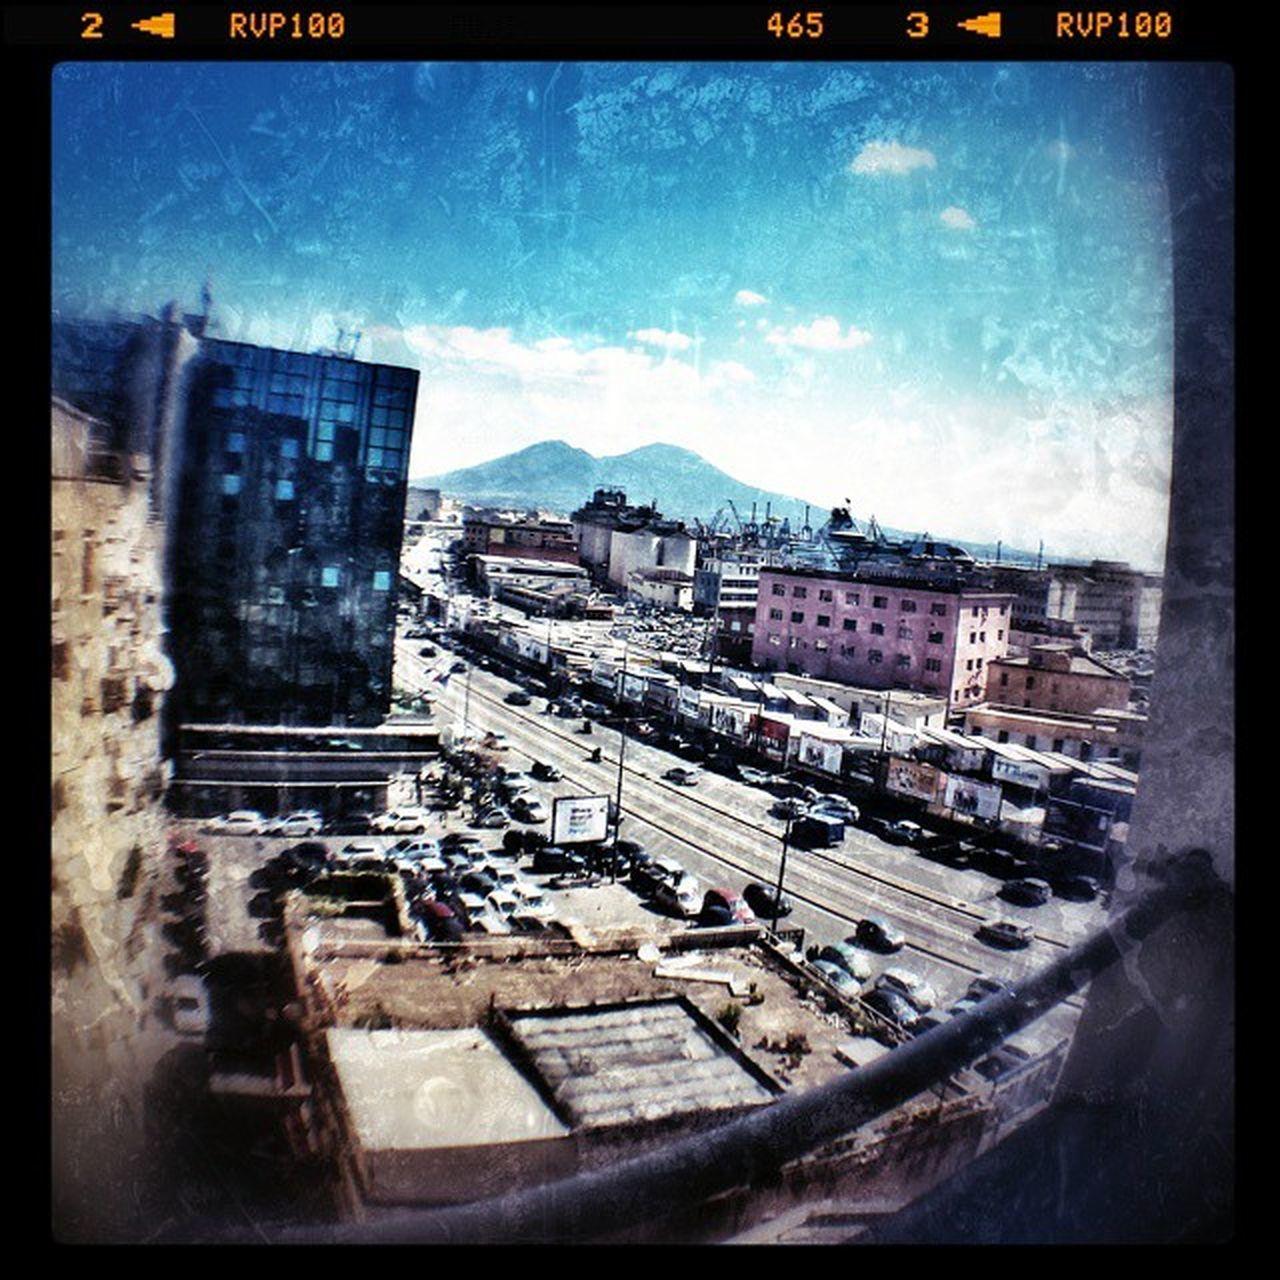 Unior Napoli Vesuvio Vesuvius  Naples Neapel Italy foto_Napoli Napolipix road traffic cars sky fisheye